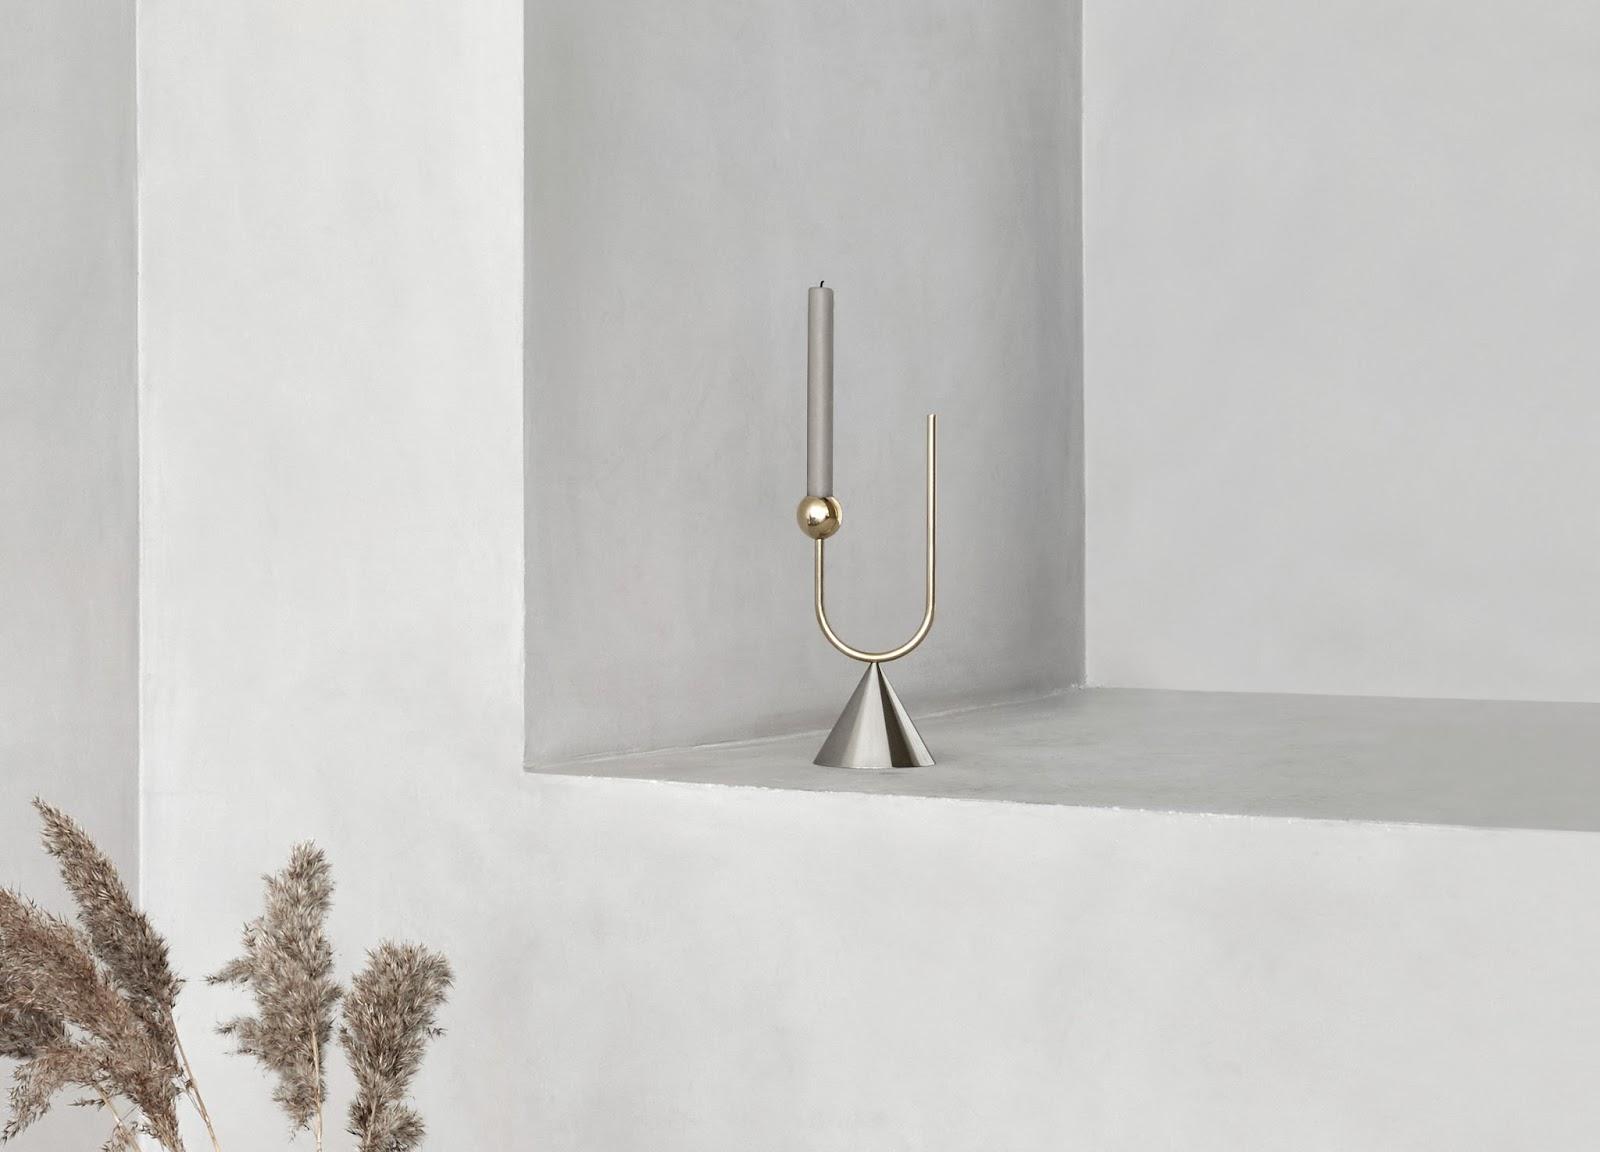 Kristina Krogh's Balance Candle Holder